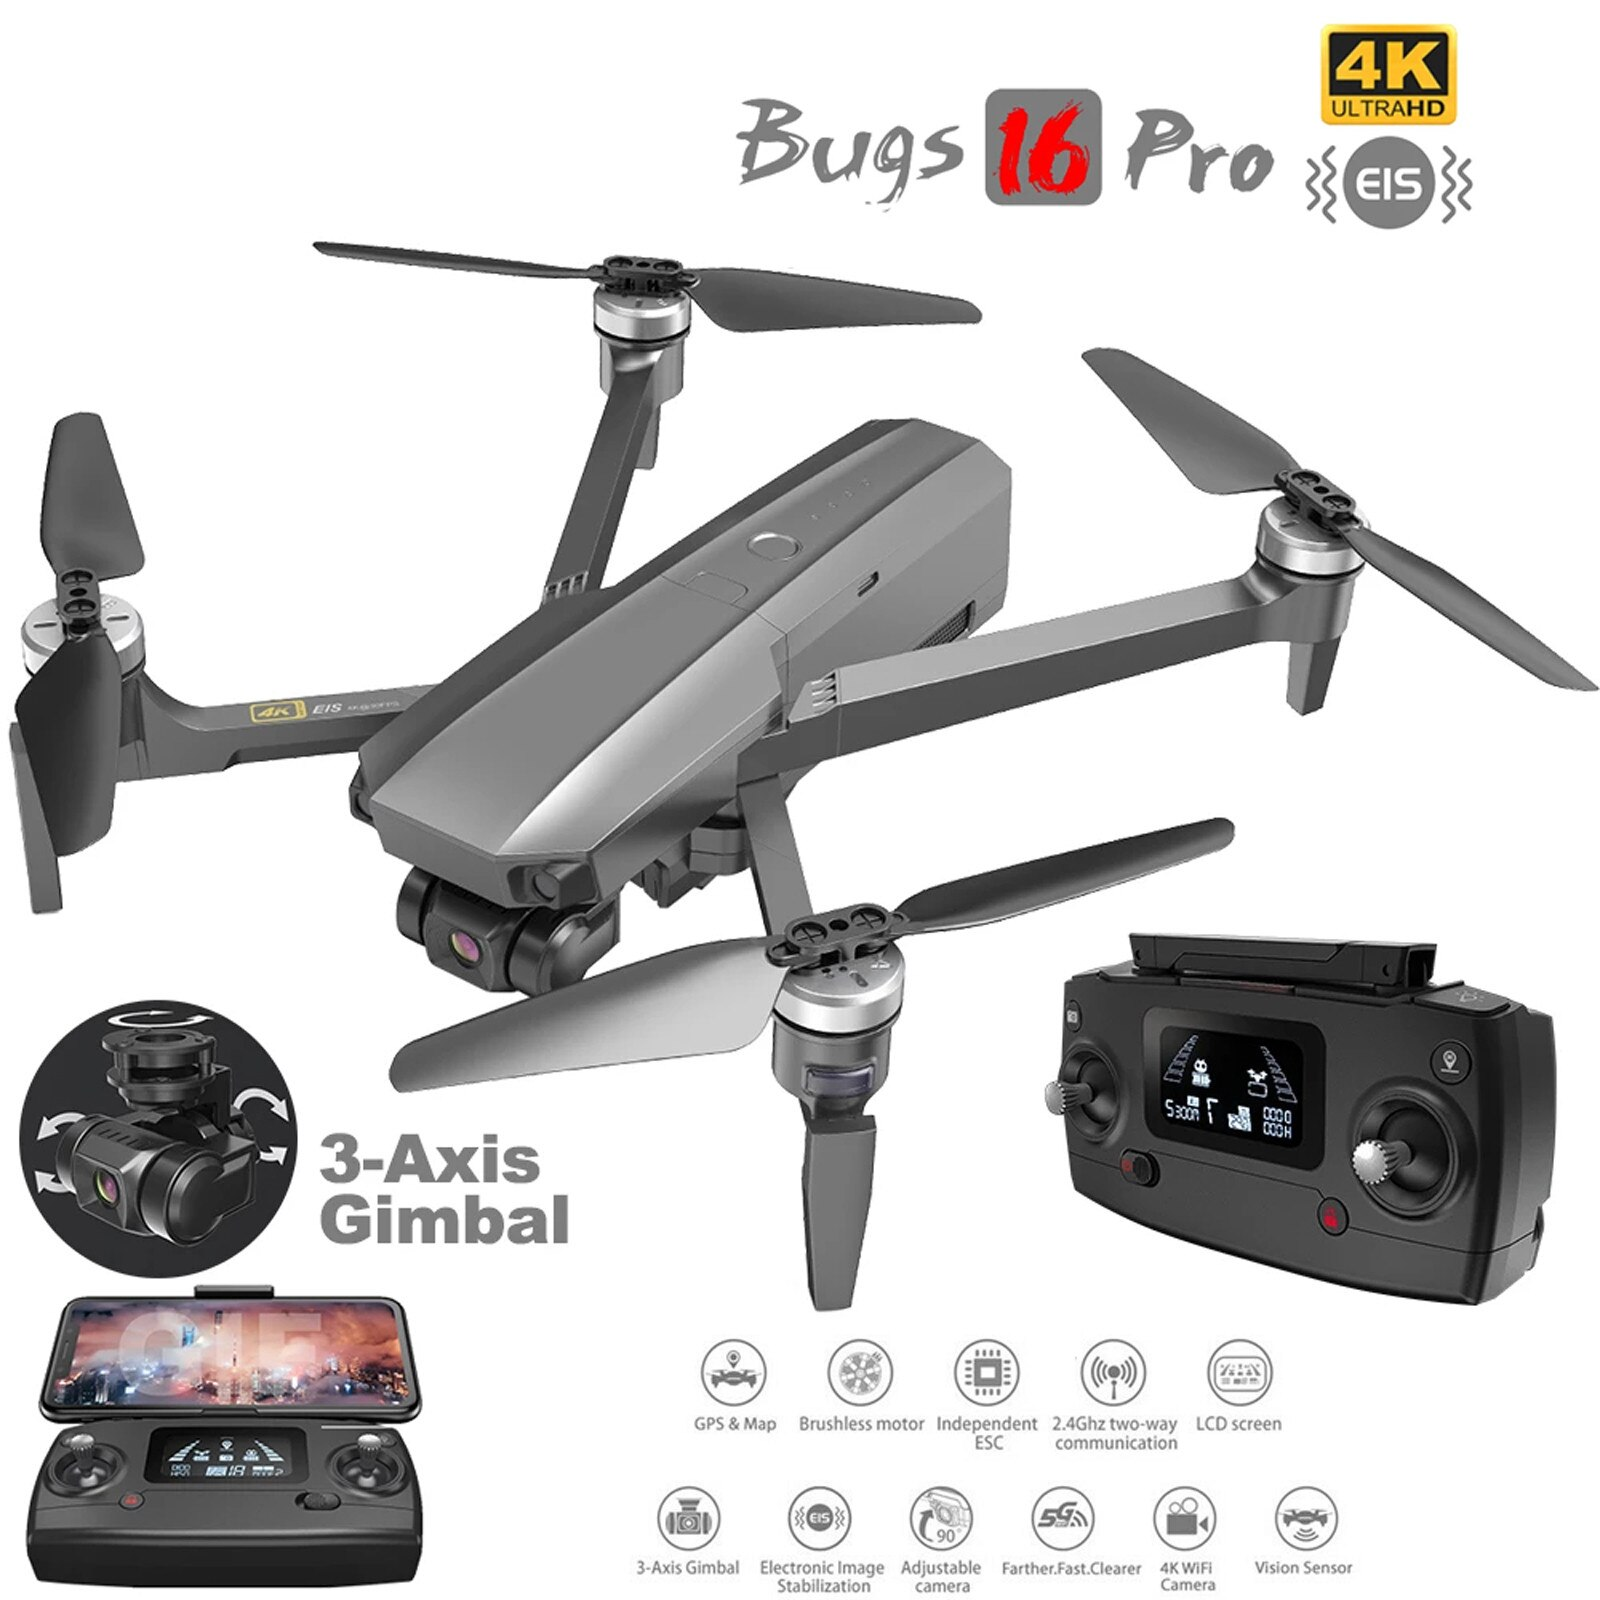 MJX-Bugs-B16-PRO-Drone-Avec-Cam-ra-HD-4K-Cardan-3-axes-Quadrirotor-L-EIE